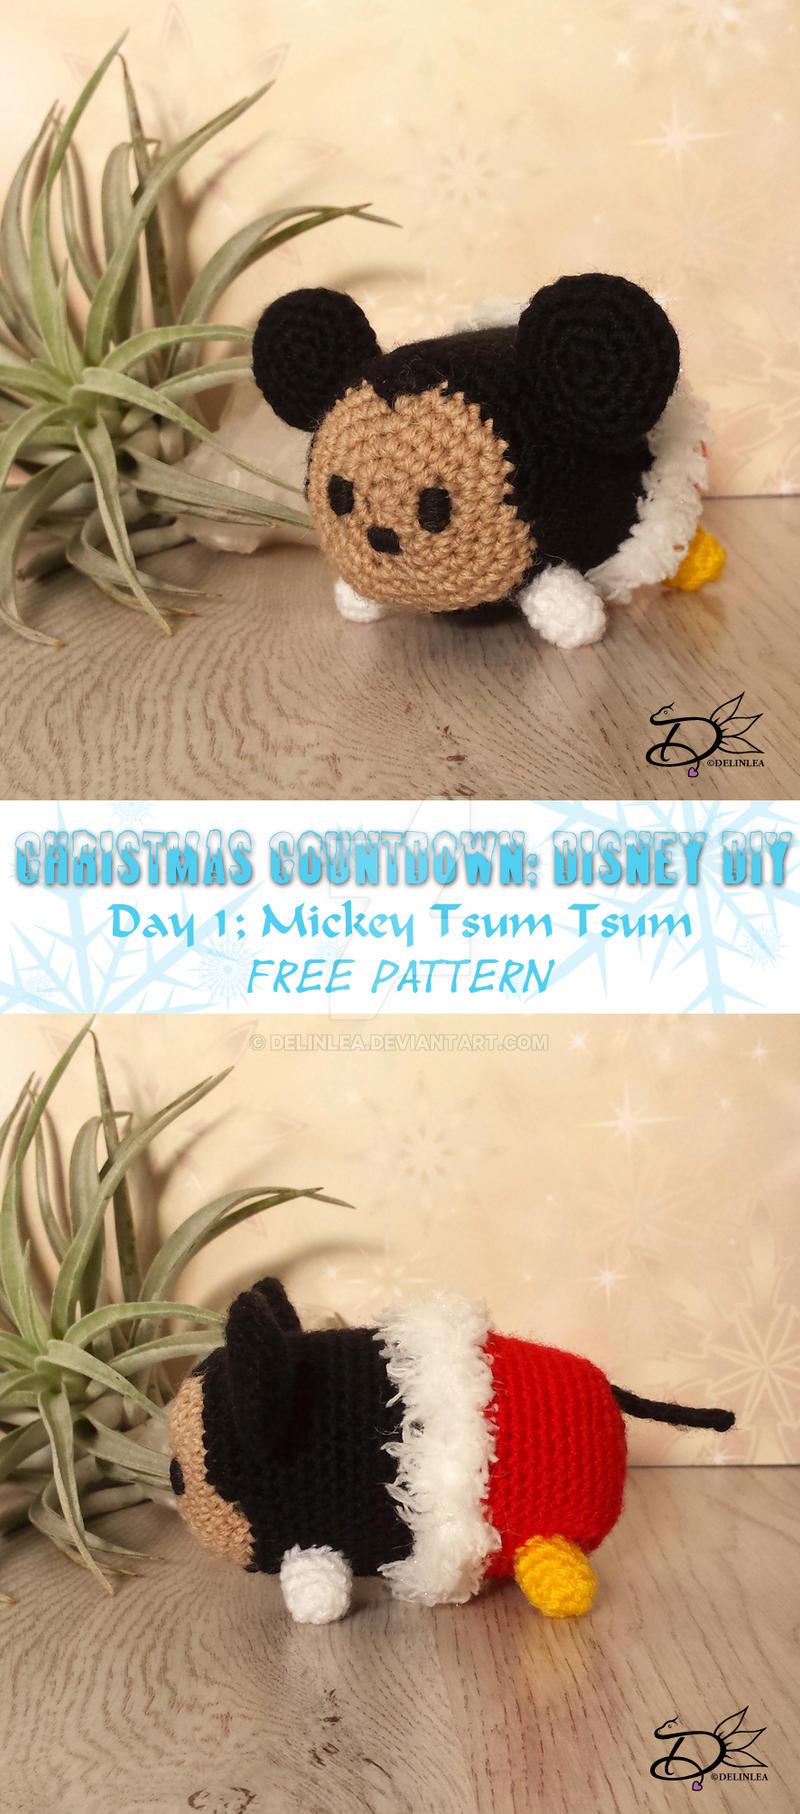 Crochet Mickey Mouse Patterns, Hat, Amigurumi ⋆ DIY Crafts | 1814x800